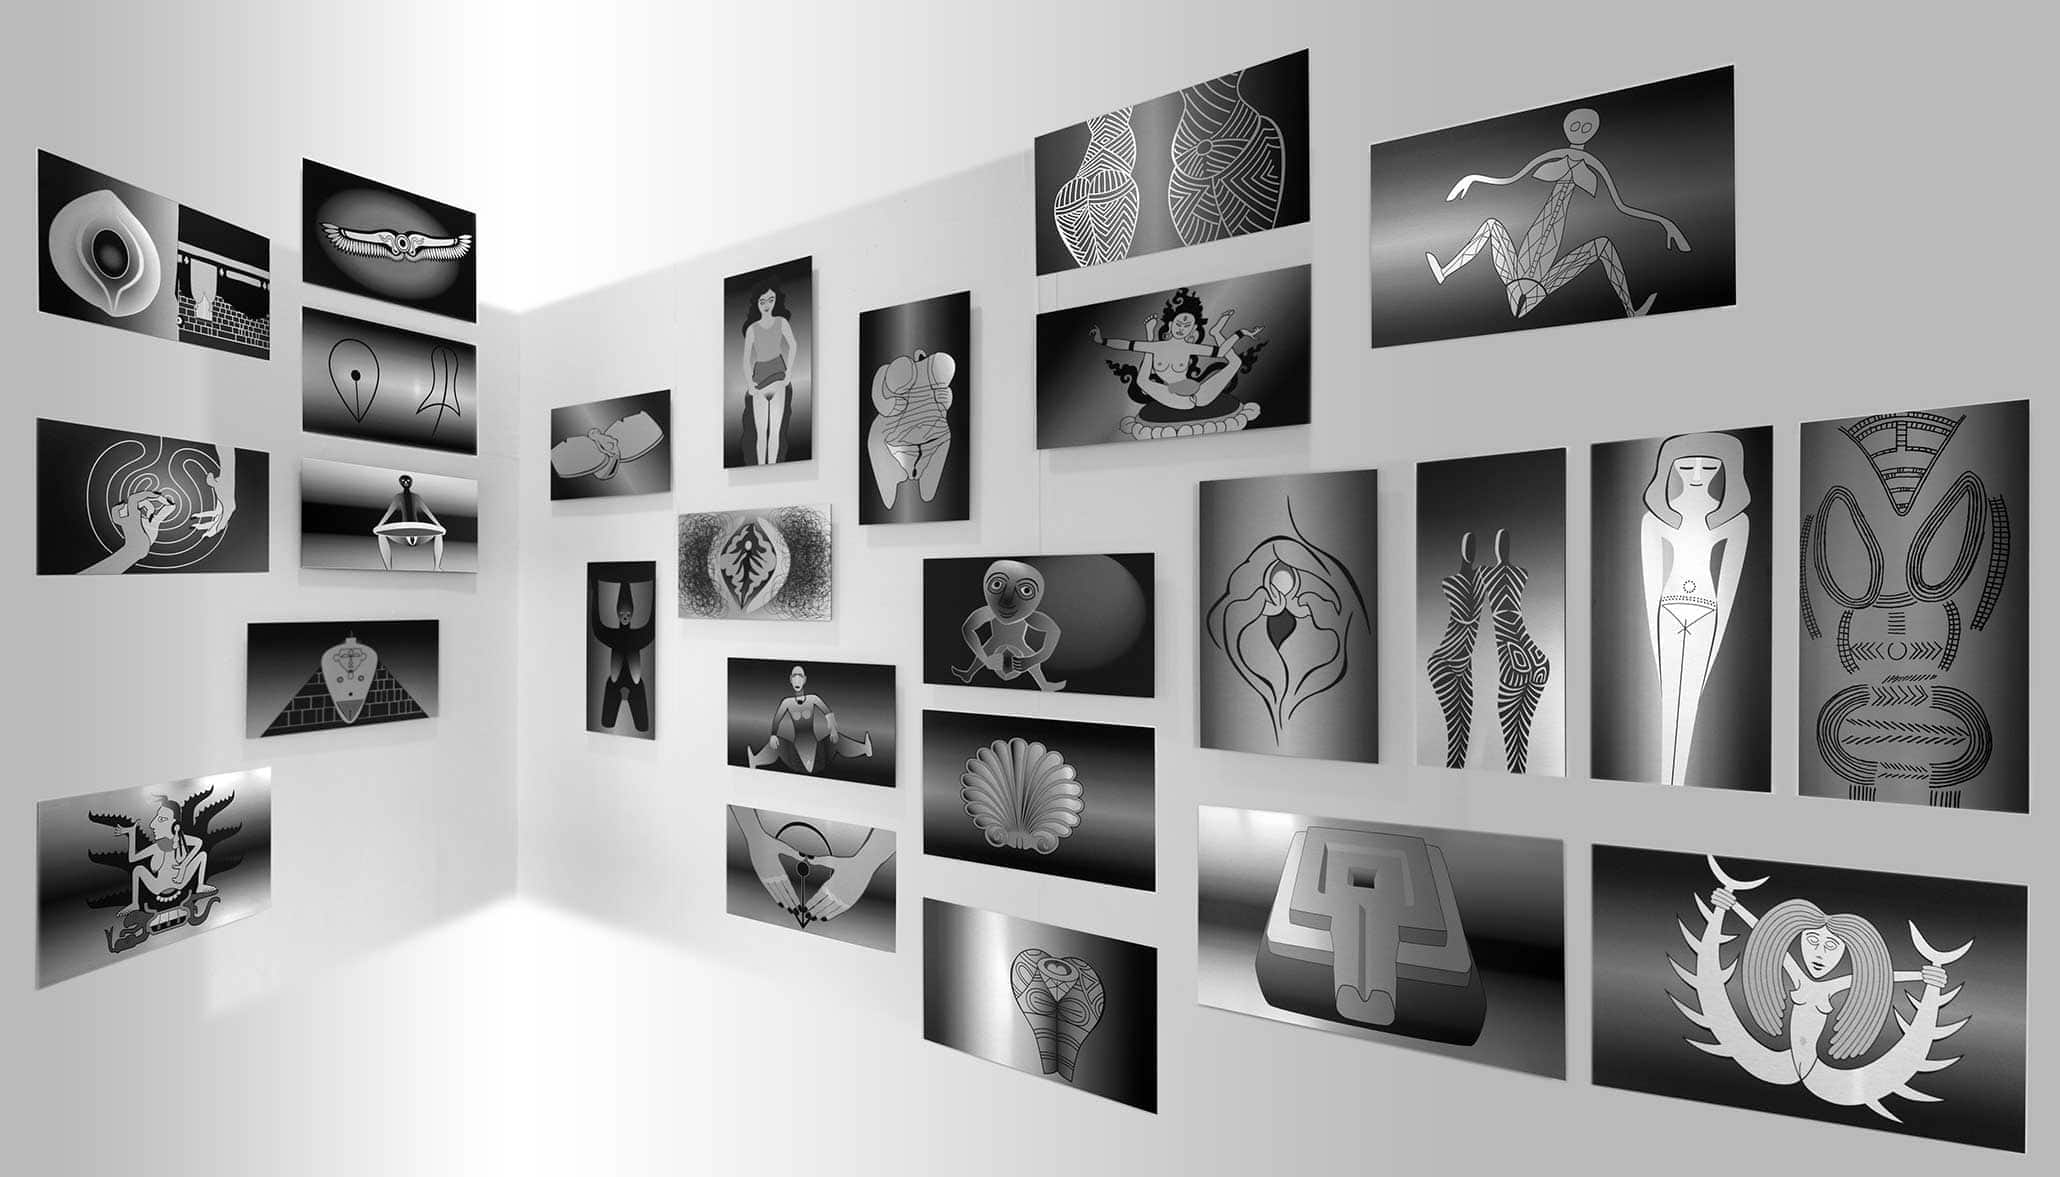 Global Vulva Plates (2014), 35 Bildtafeln, Tintenstrahl-Druck direkt auf Aluminium, je 27 x 48 cm.